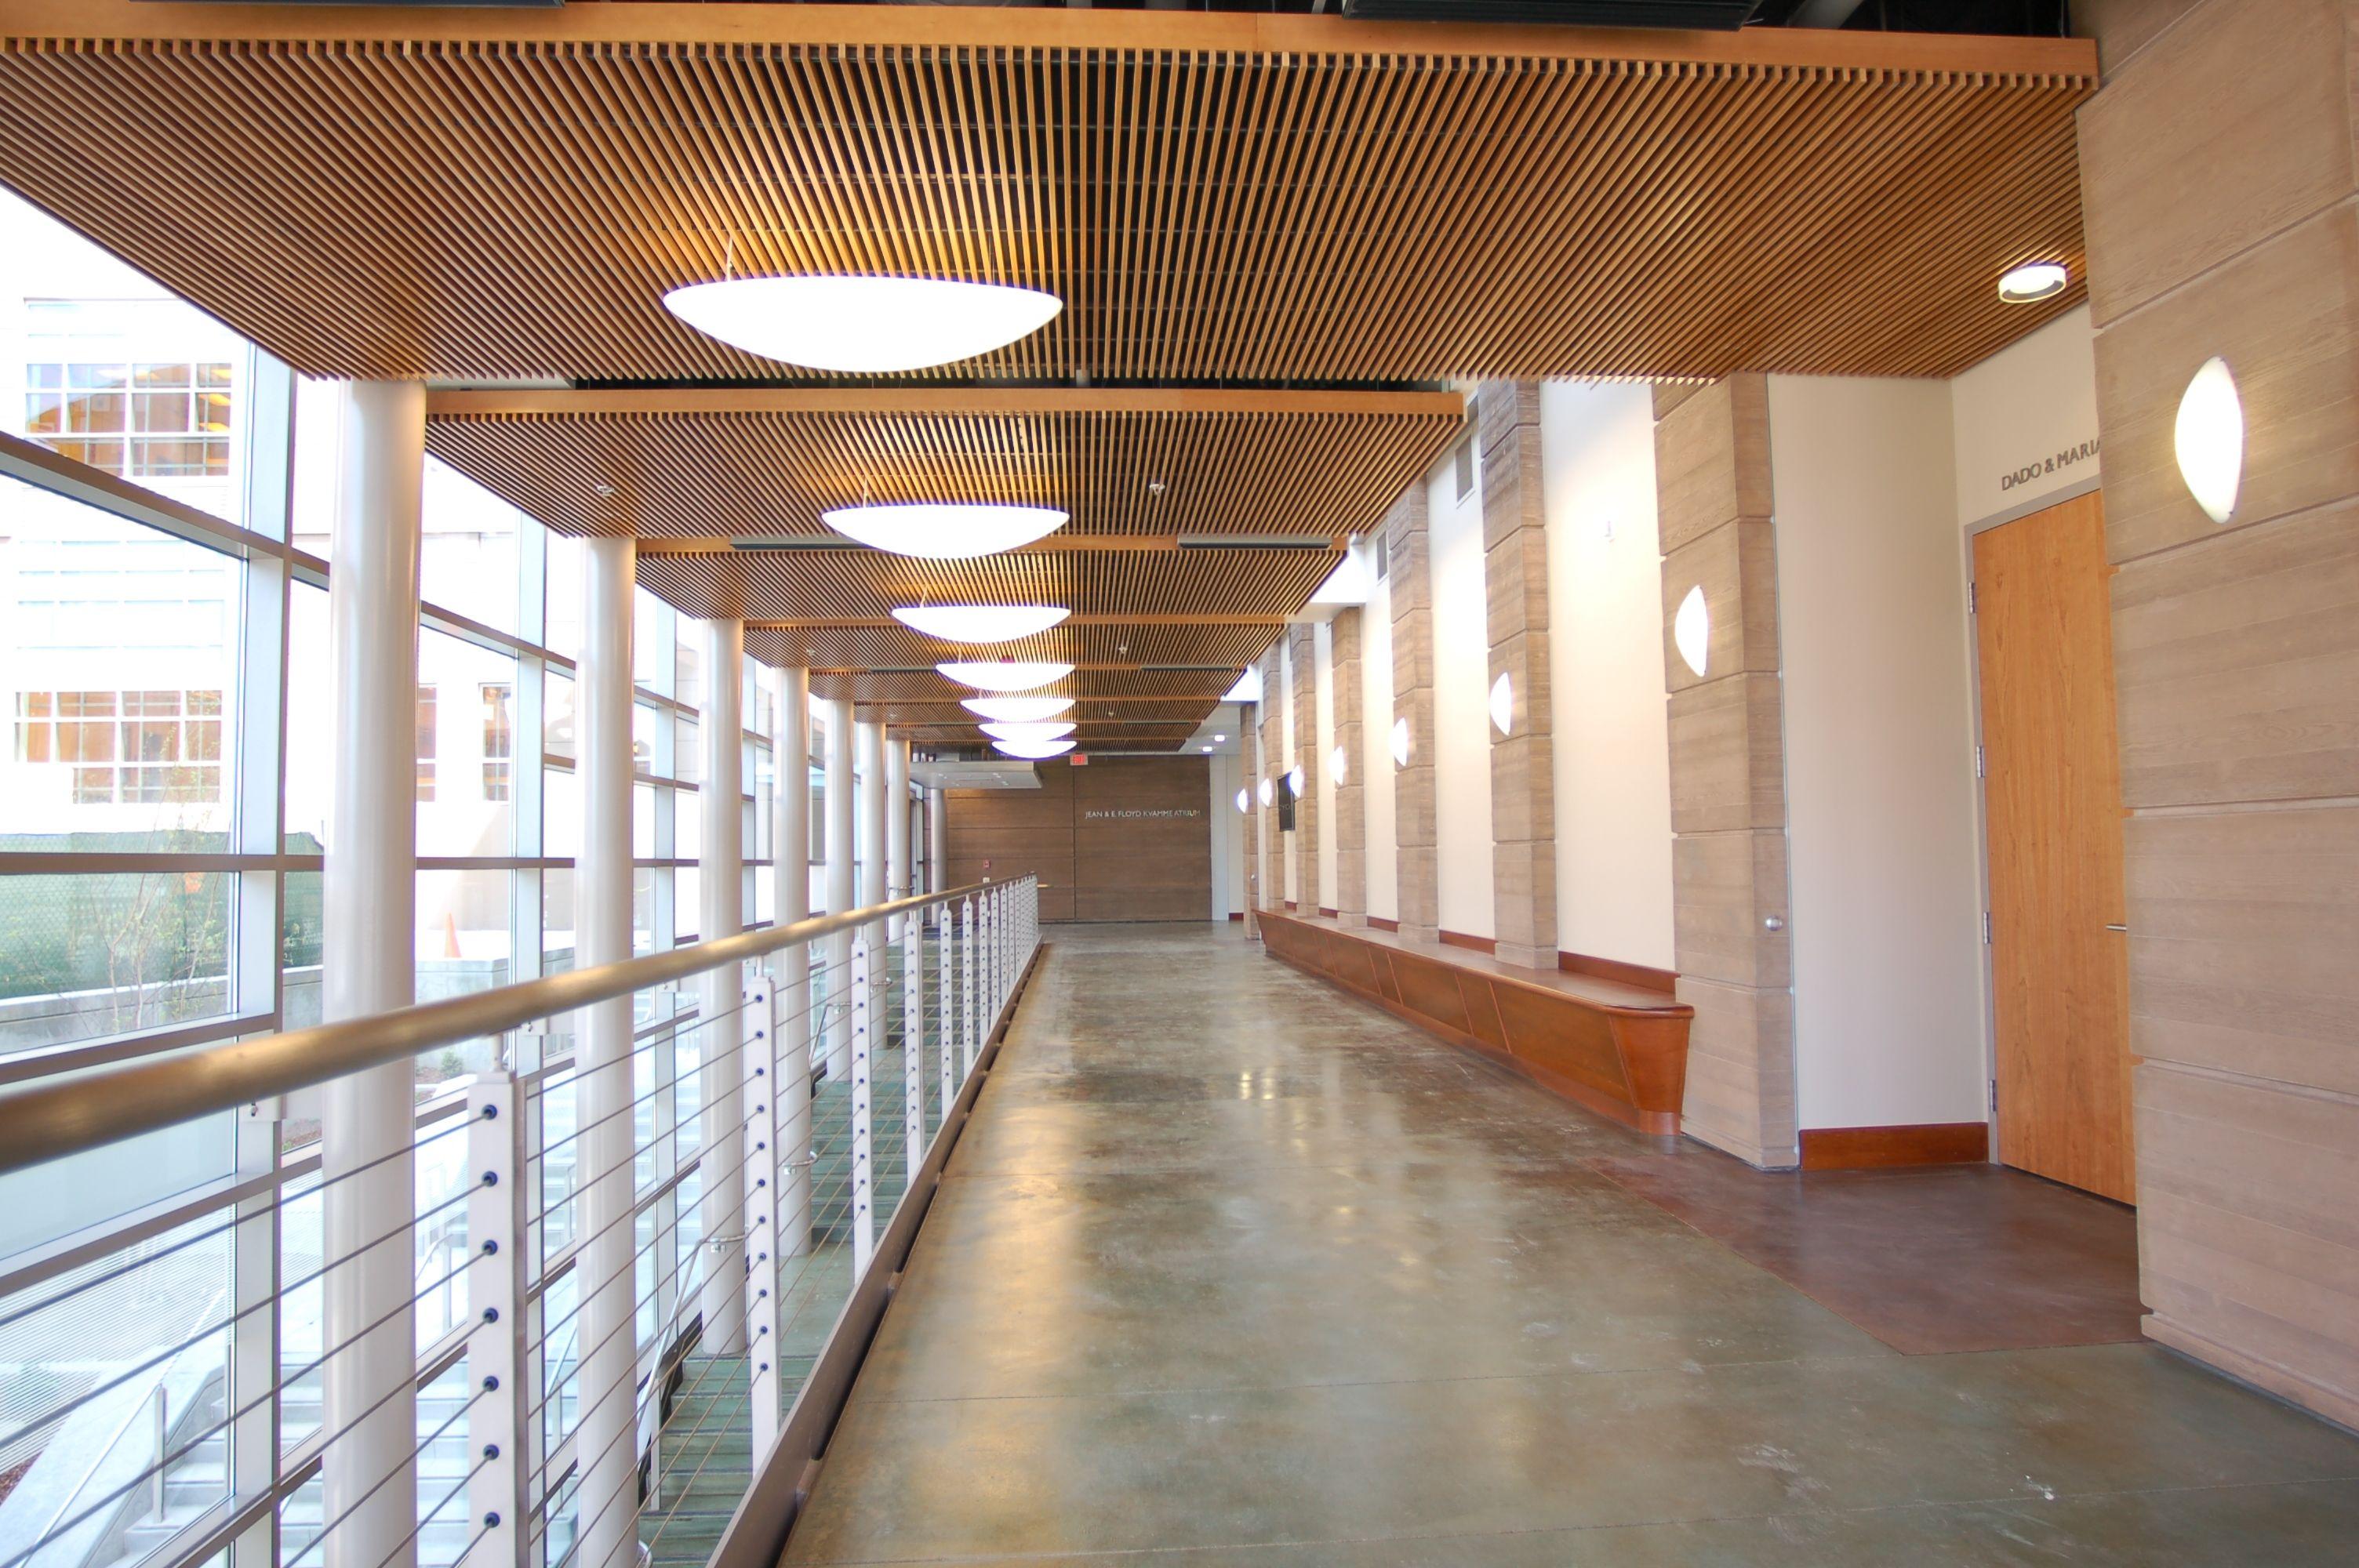 Interior vertical wood slats wall google search office design inspiration pinterest wood - Wood slat ceiling system ...